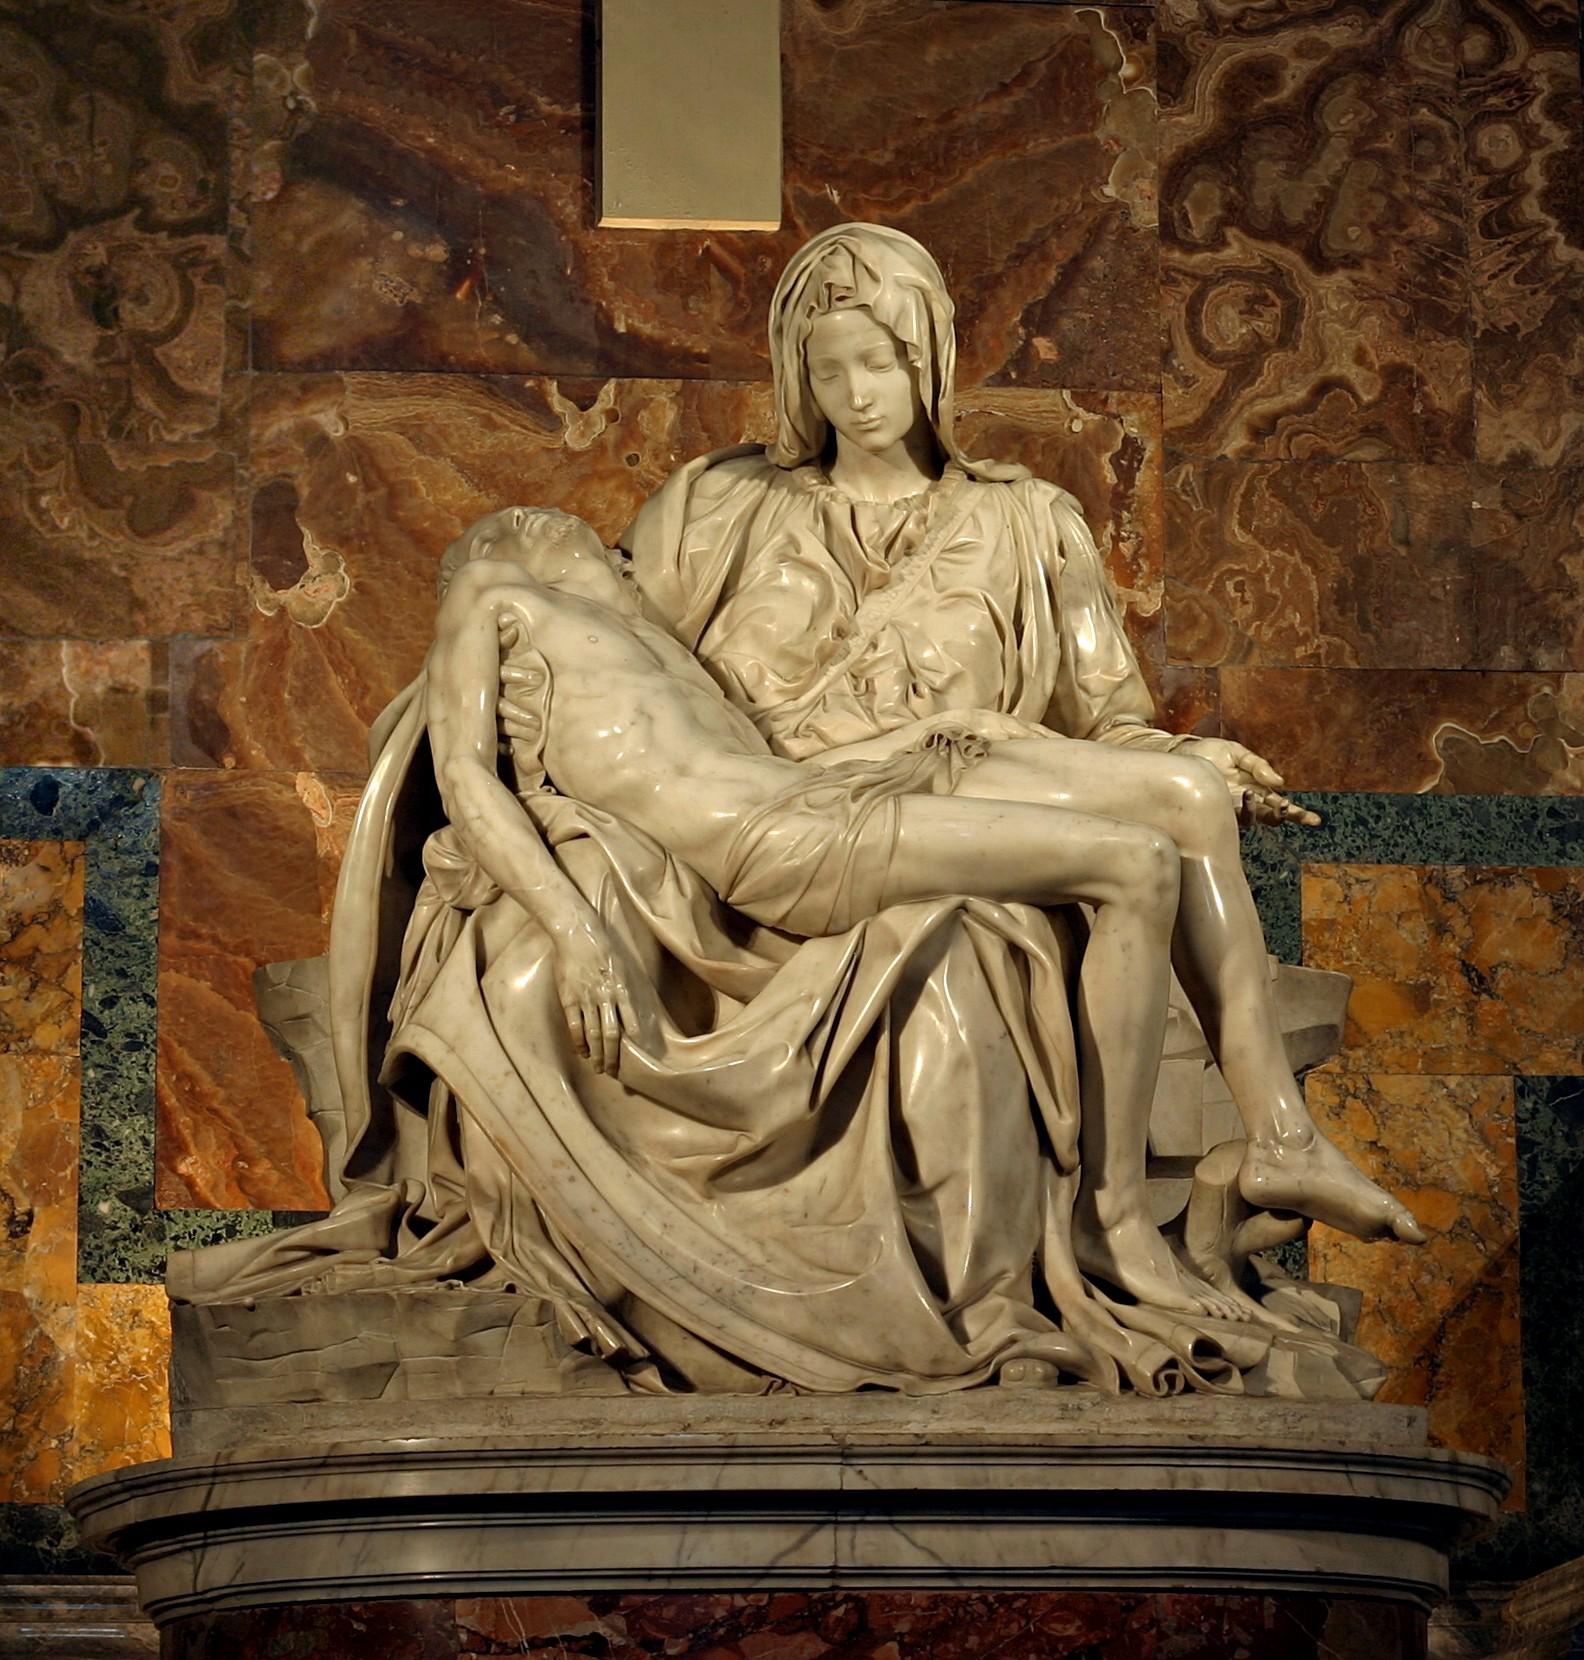 11-02 Michelangelo's_Pieta_5450_cropncleaned.jpg